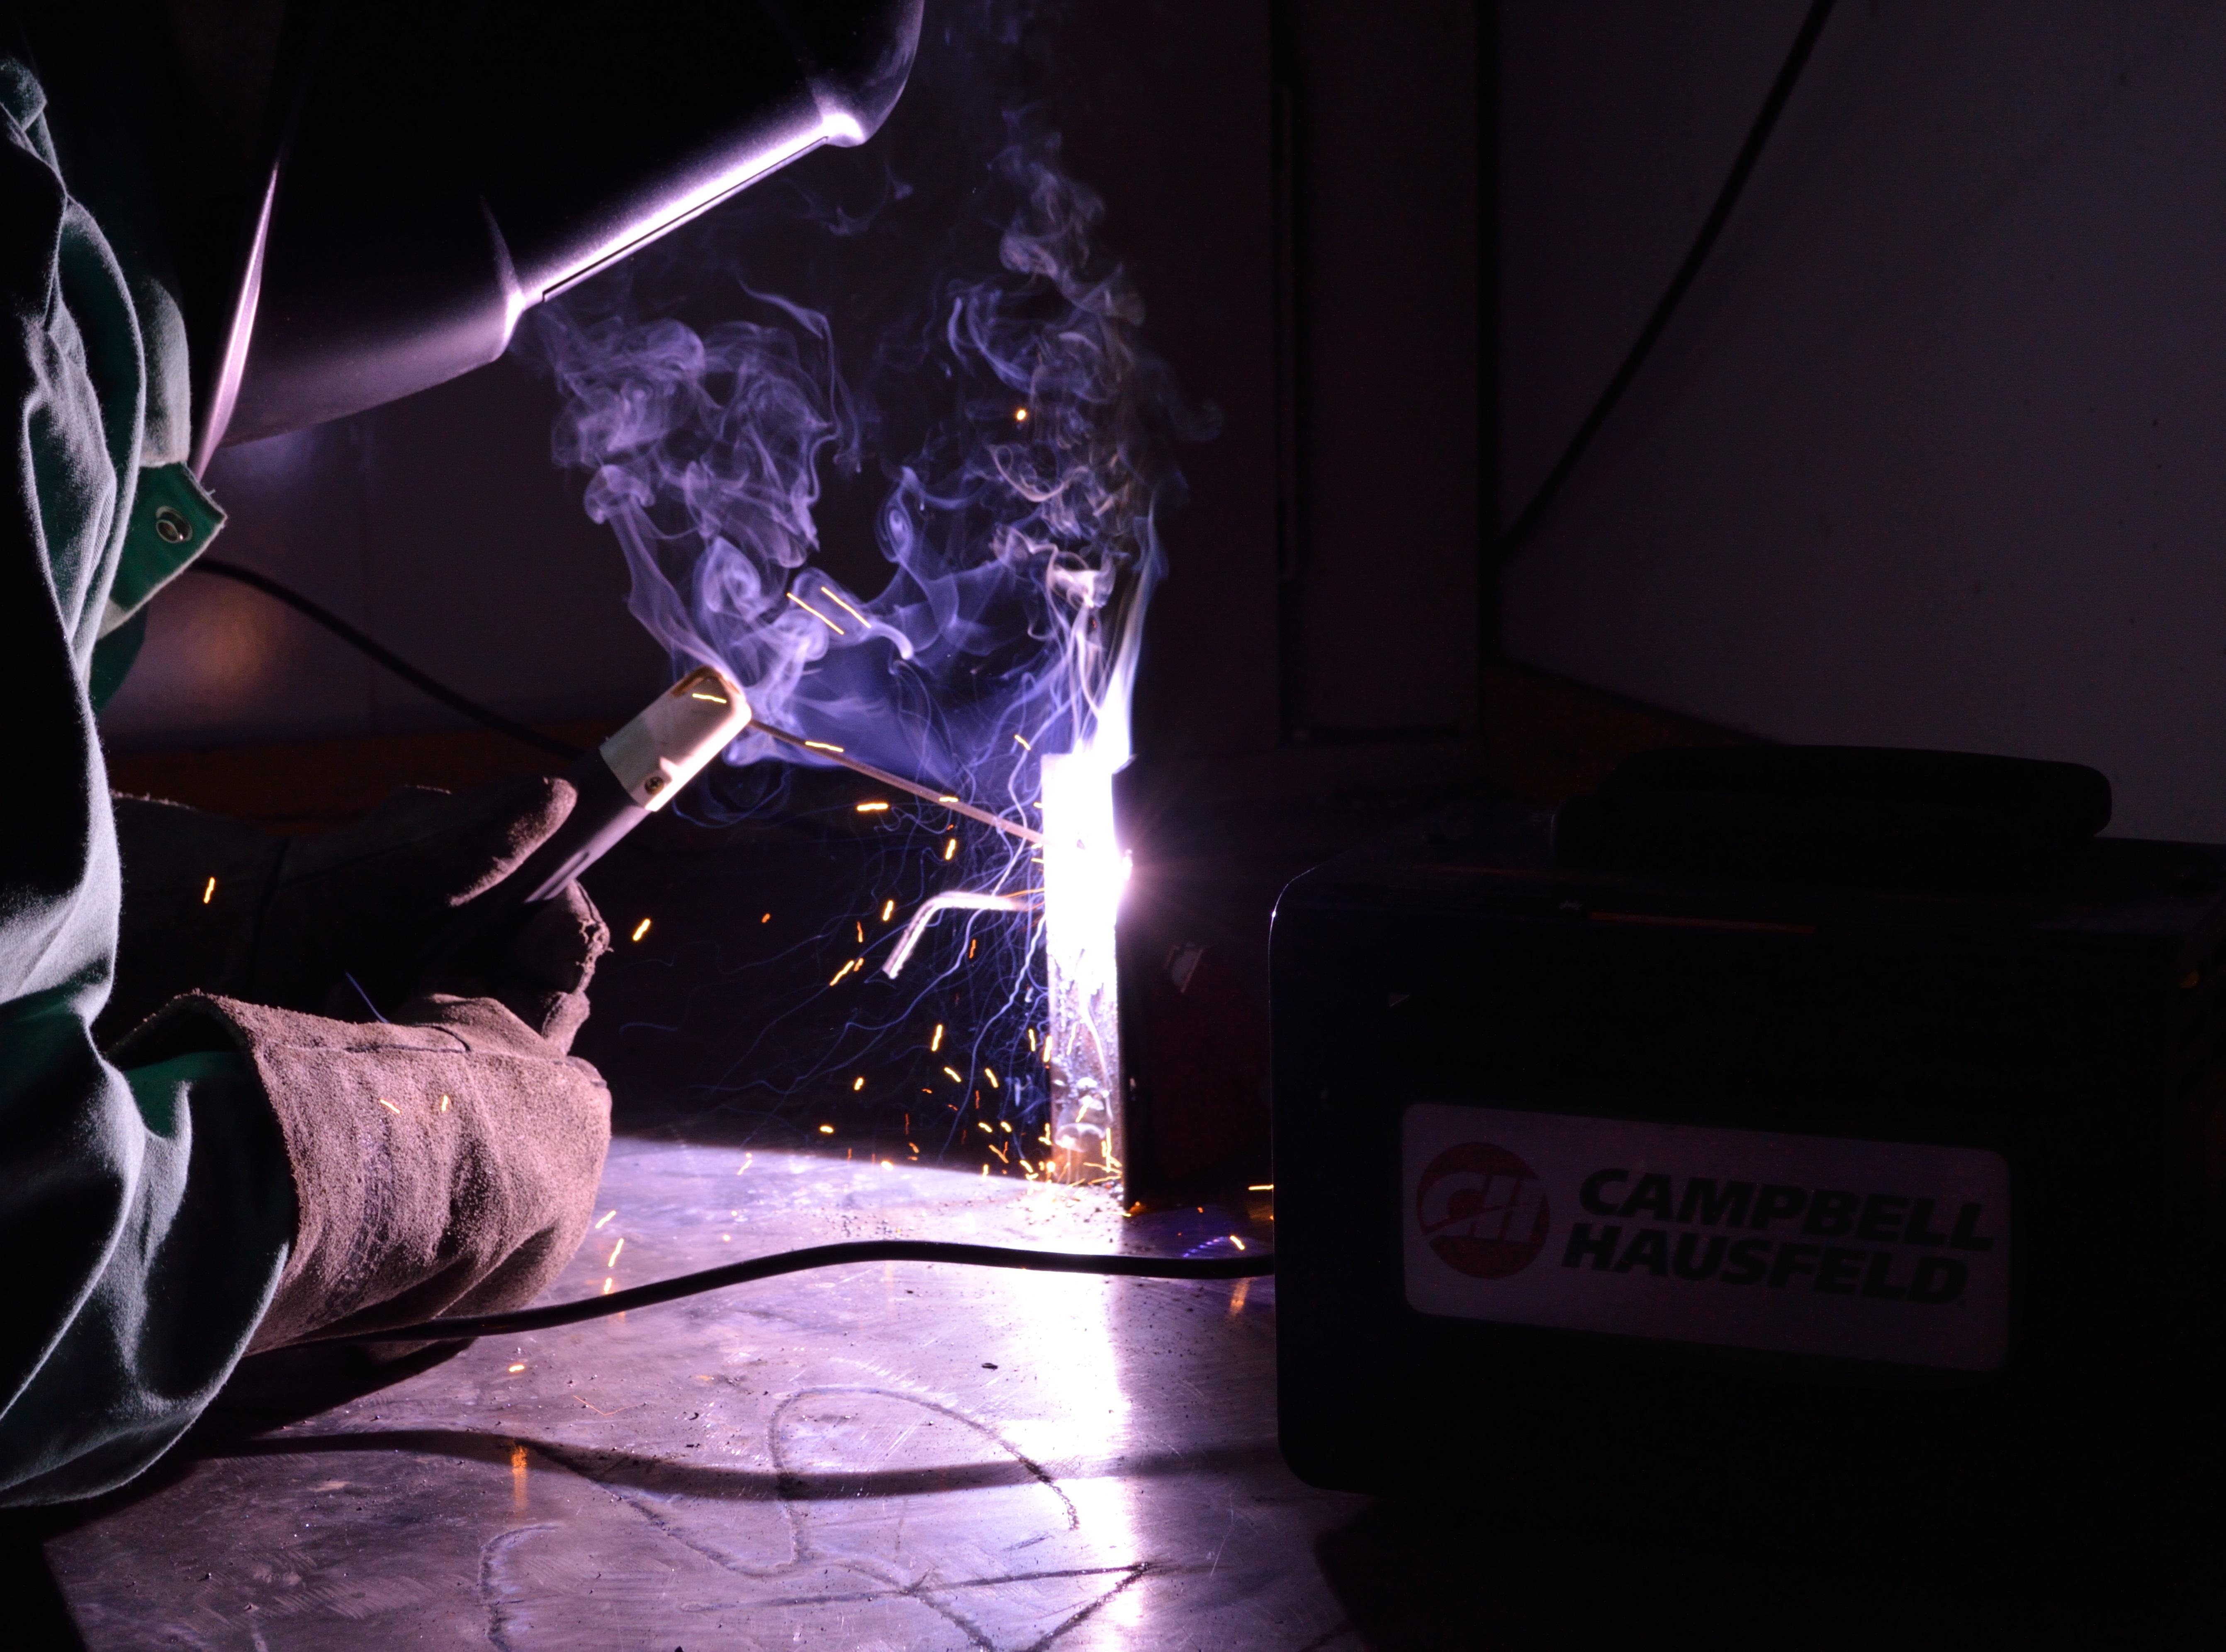 Arc Stick Welder 115 Volt 70 Amp Campbell Hausfeld Ws099001av Mig Welding Equipment Diagram View Larger